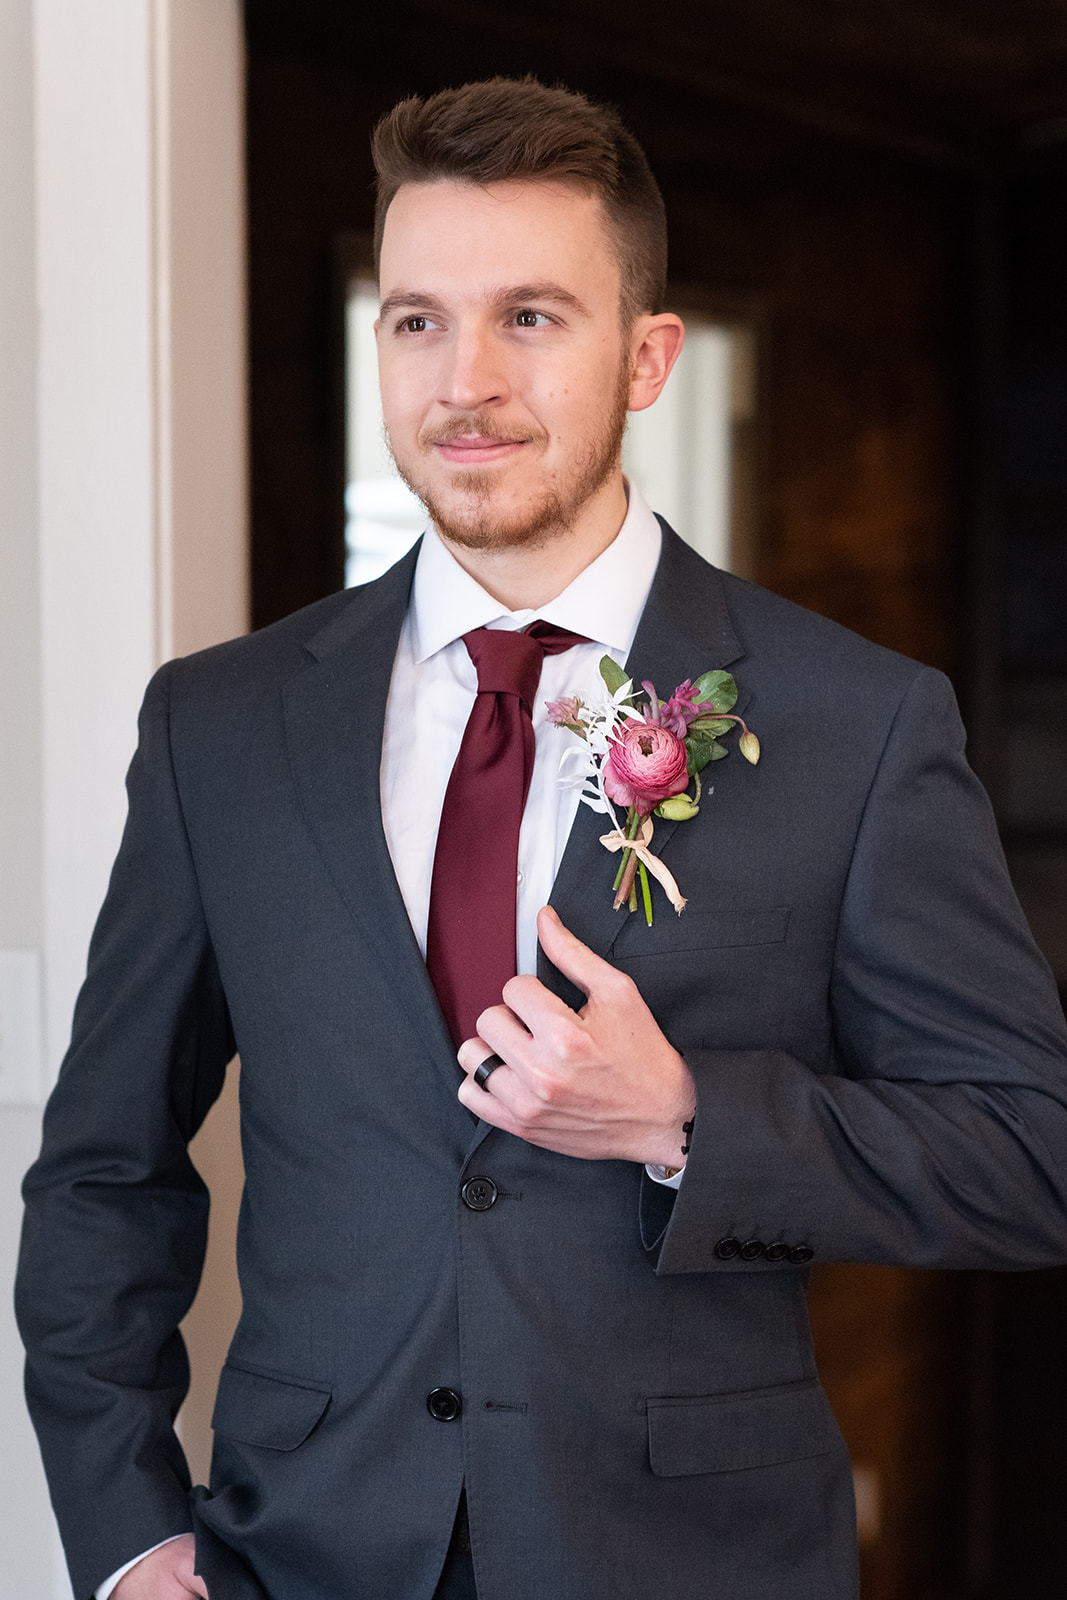 Petals & Stem wedding boutonniere